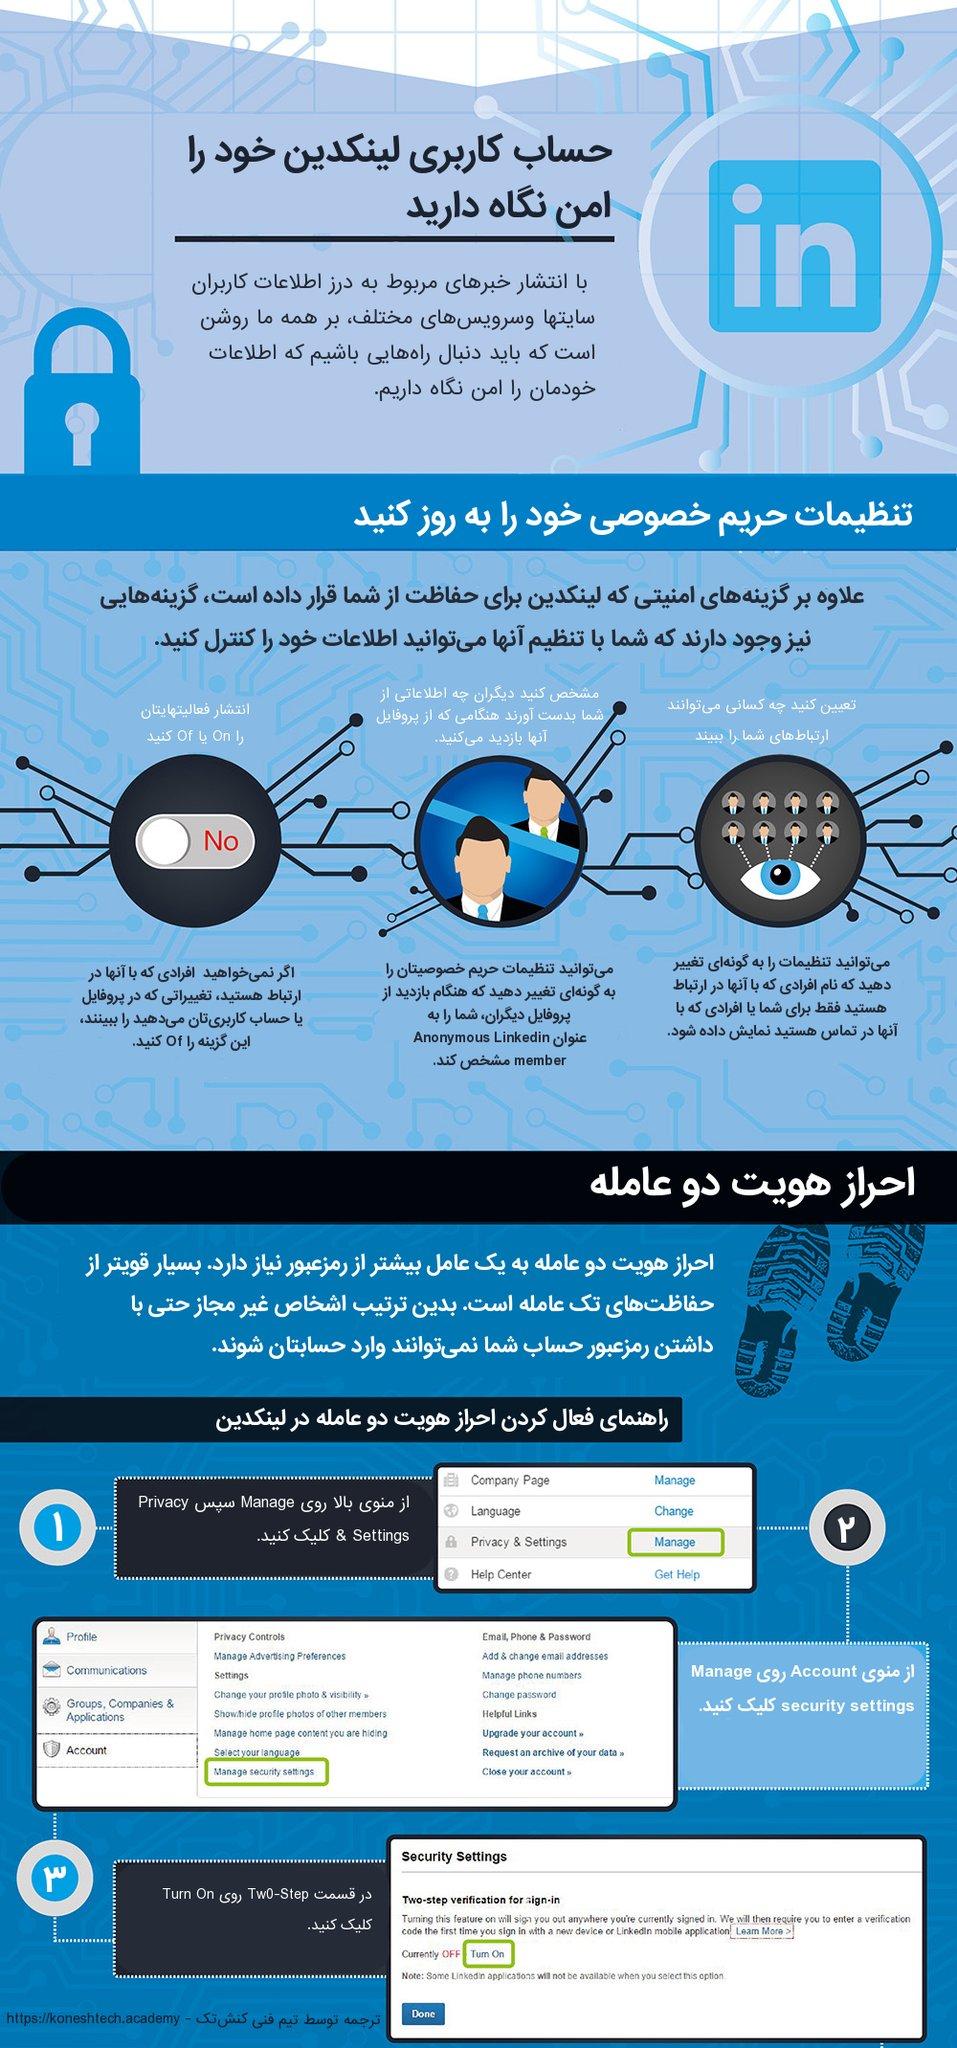 ایفوگرافیک تنظیمات امنیتی لینکدین